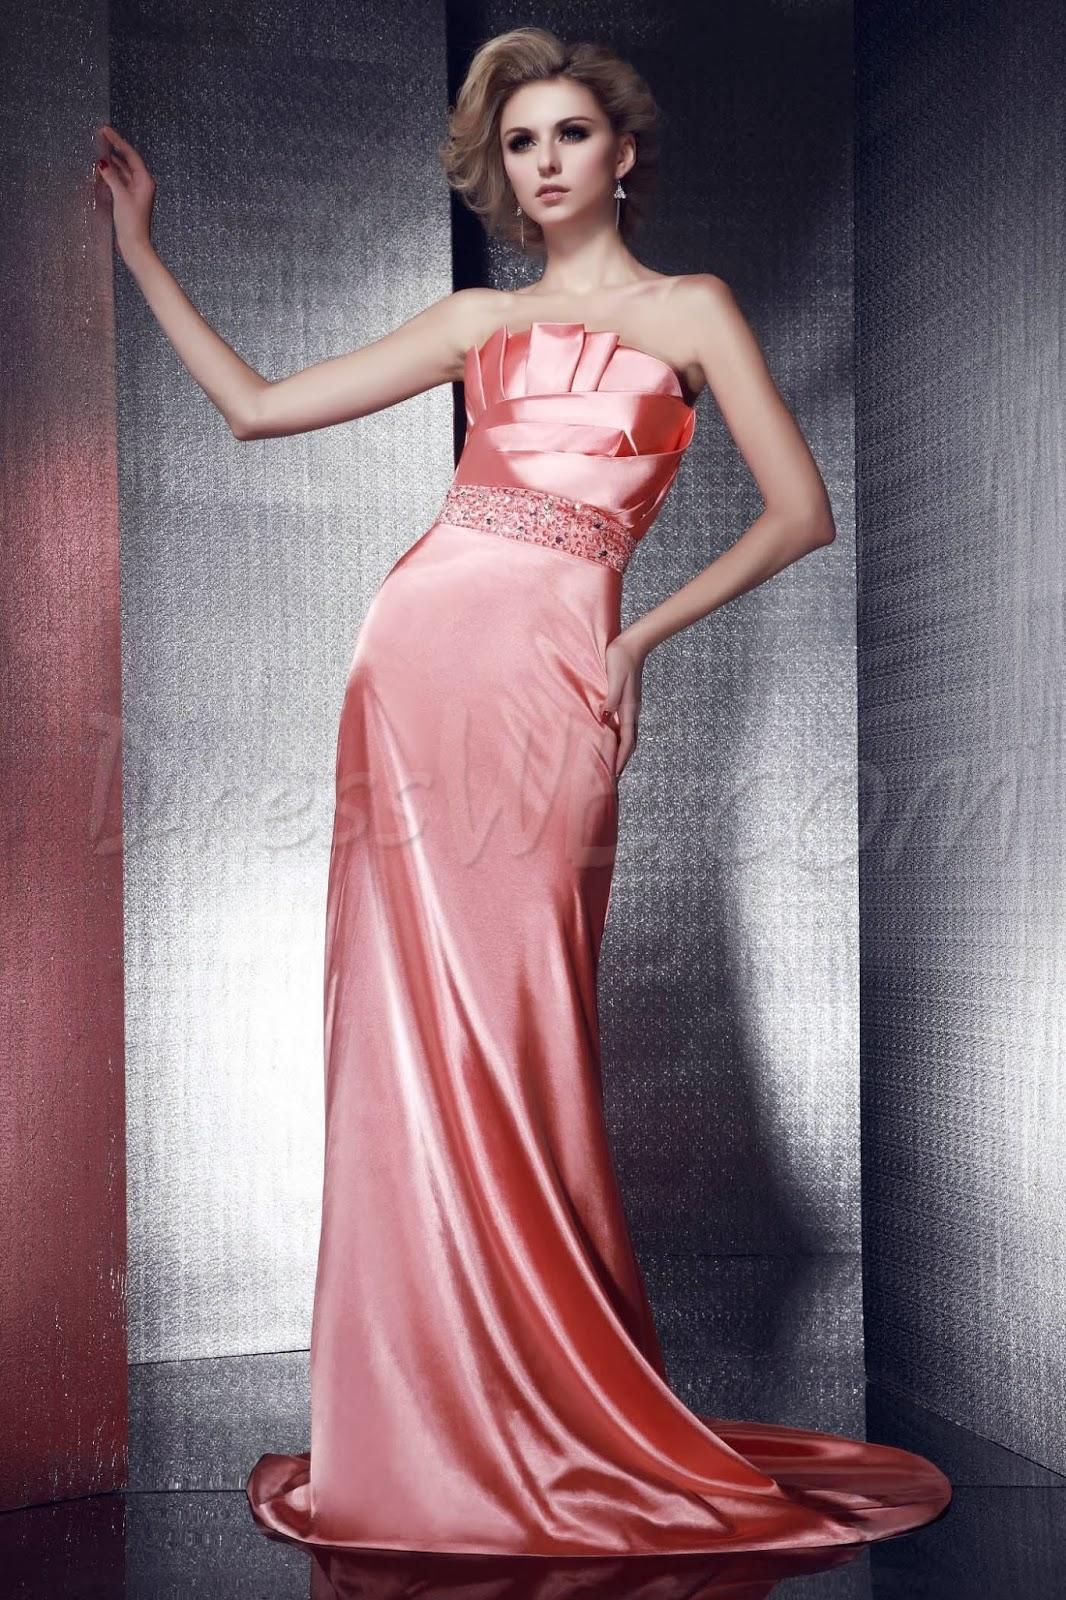 Go Vintage This Prom Season - By Dresswe | CanVirRies